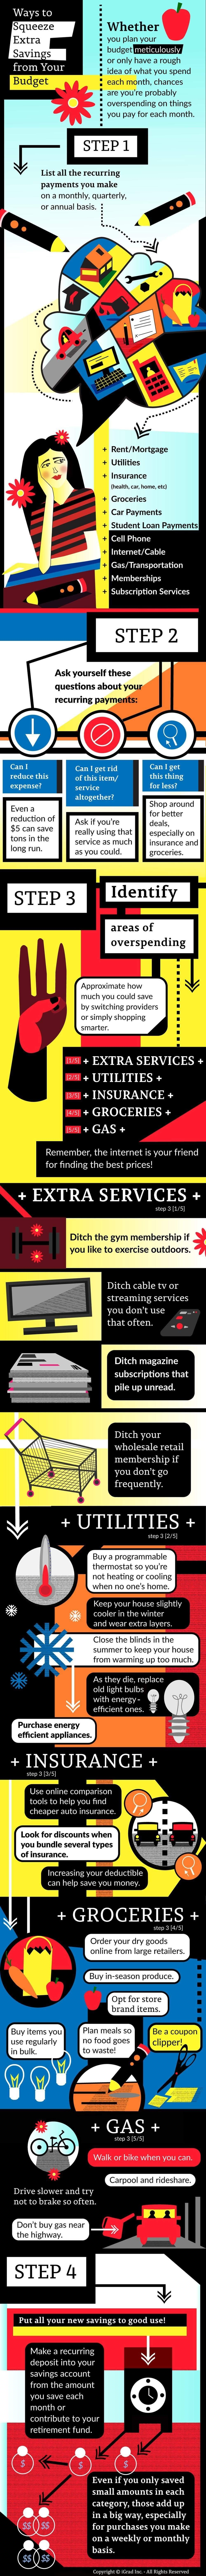 Ways to squeeze extra budget savings #inographic